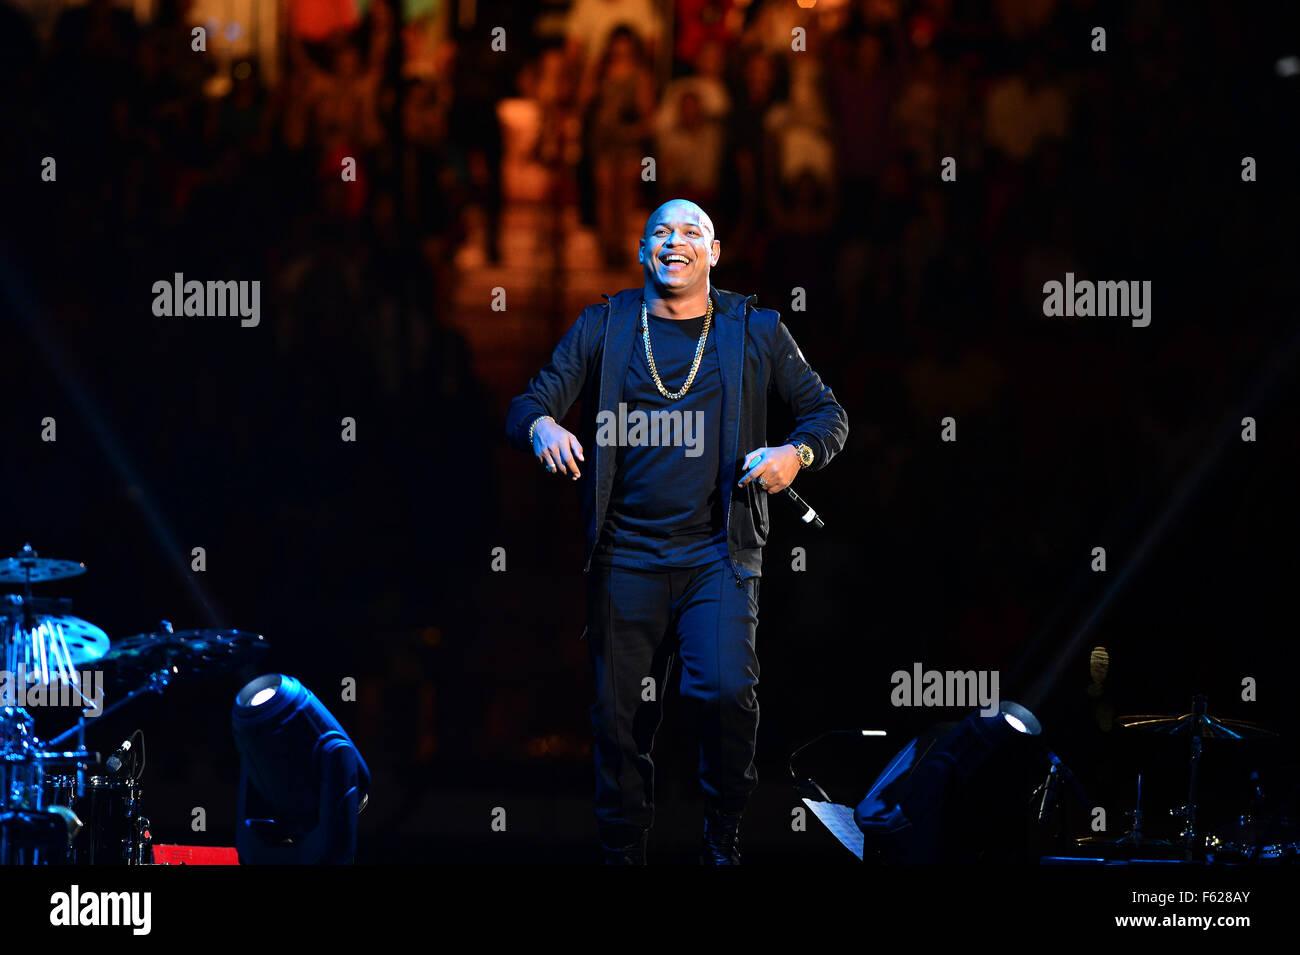 Gente de Zona perform at the American Airlines Arena  Featuring: Alexander Delgado, Gente de Zona Where: Miami, Stock Photo